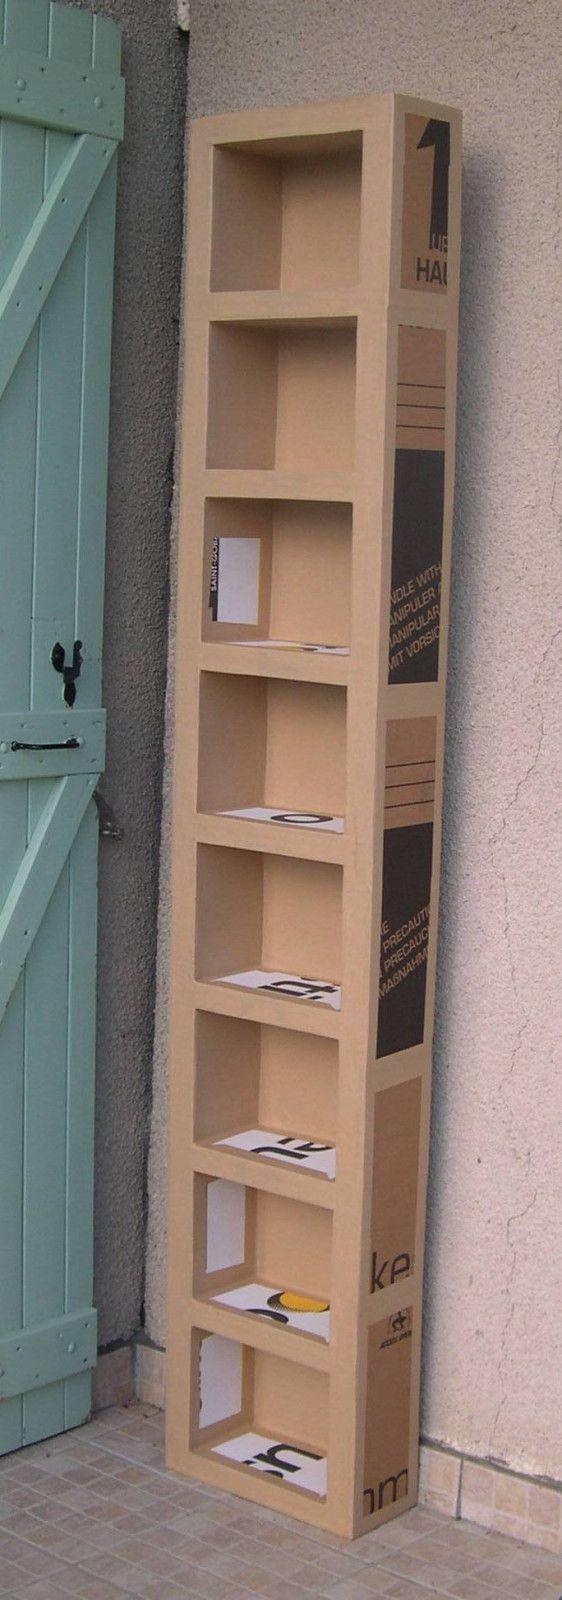 Las 25 mejores ideas sobre estantes de carton en for Estantes de carton